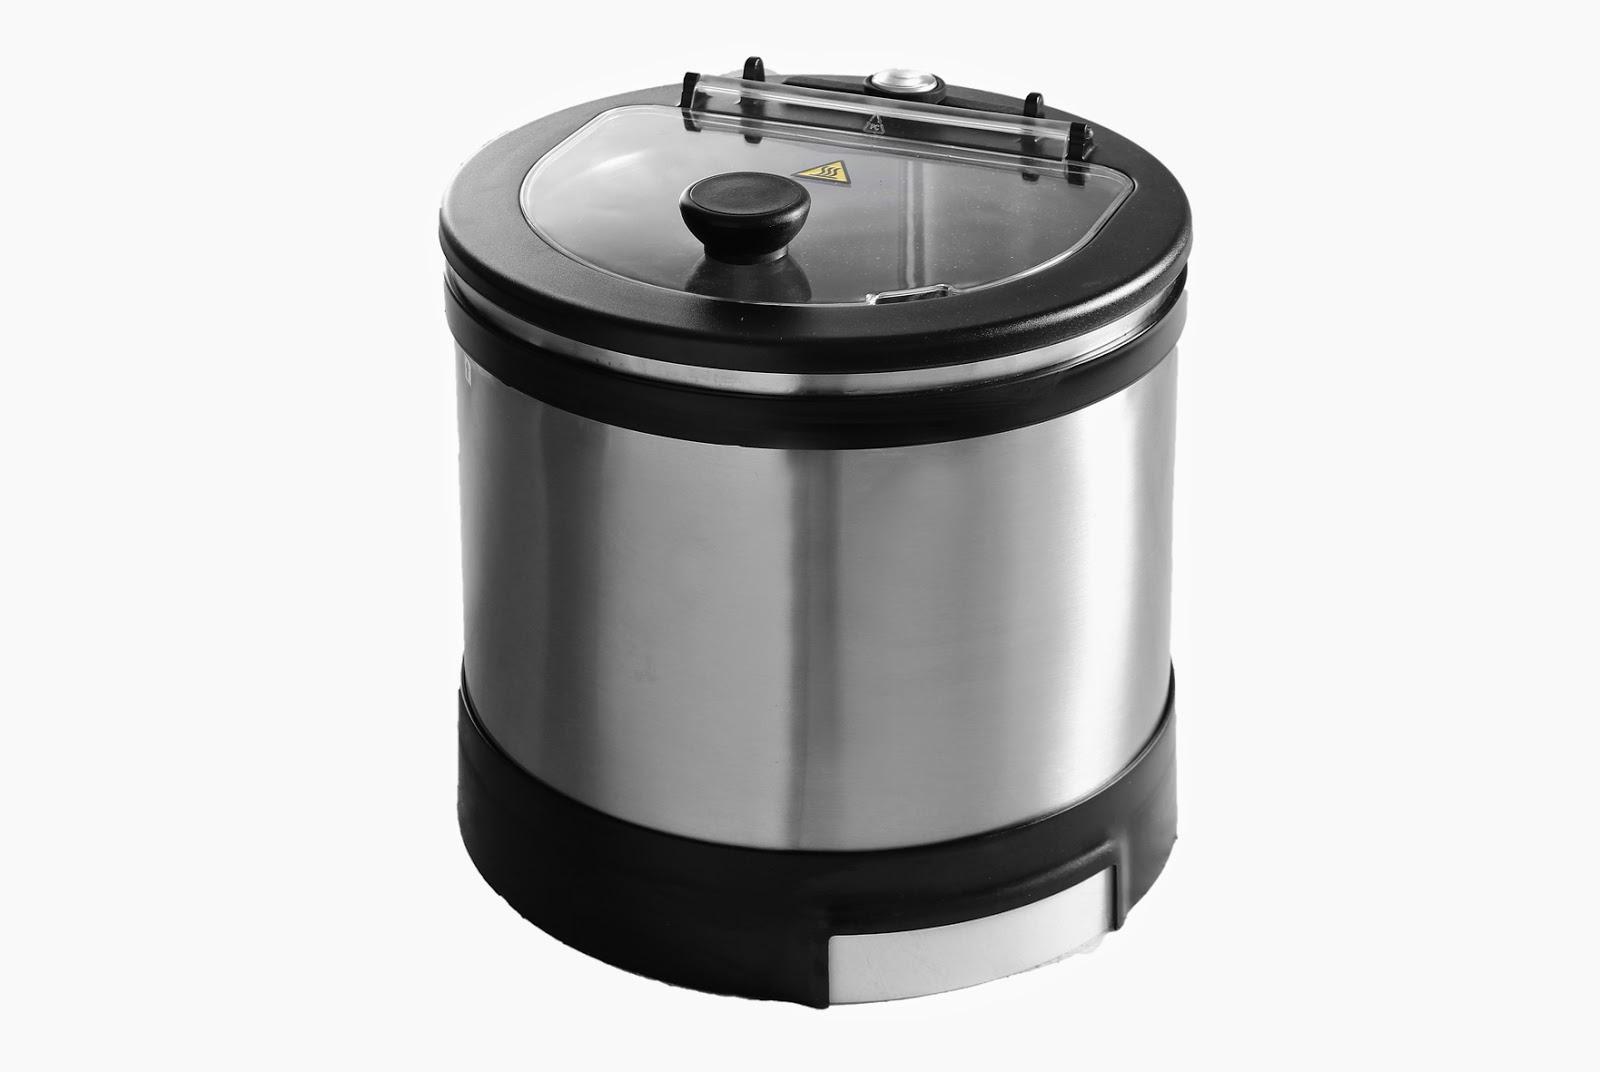 Oala - Container Termic, Supiera Termoizolanta Profesionala Horeca, Capacitate de 7 litri, Pret la reducere de 666 RON cu TVA, Amenajari Horeca, Produse Servire Bufet